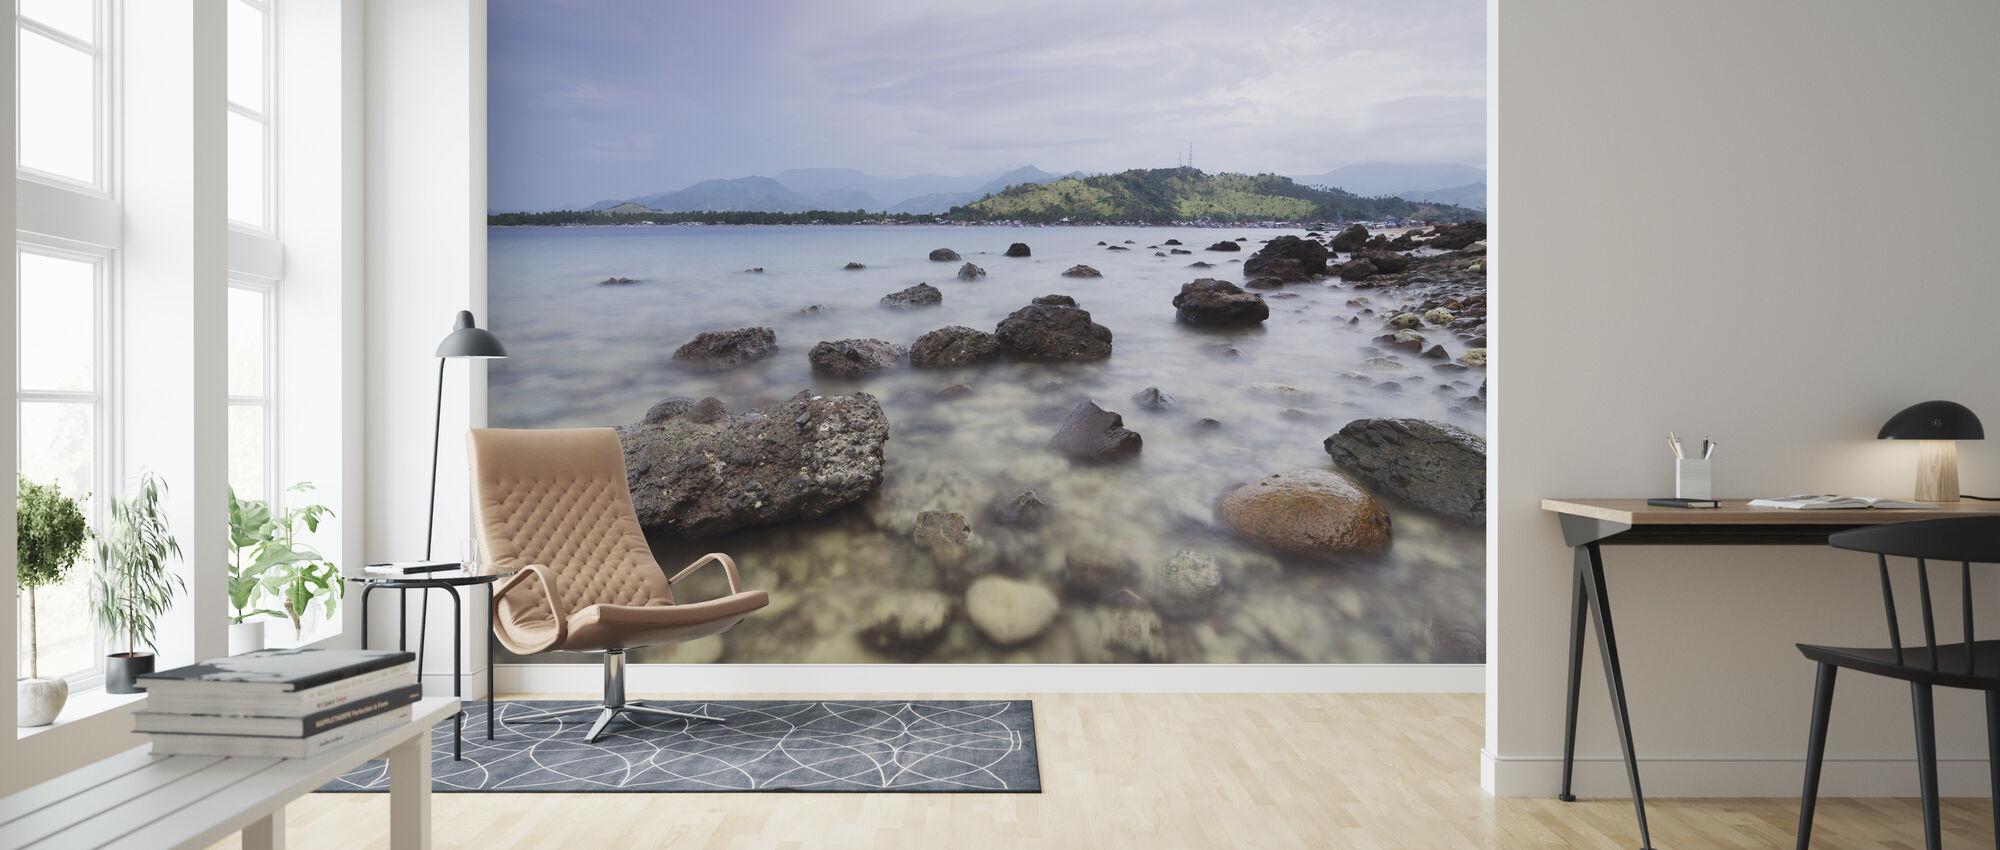 Rocks in Tibanban Island - Wallpaper - Living Room